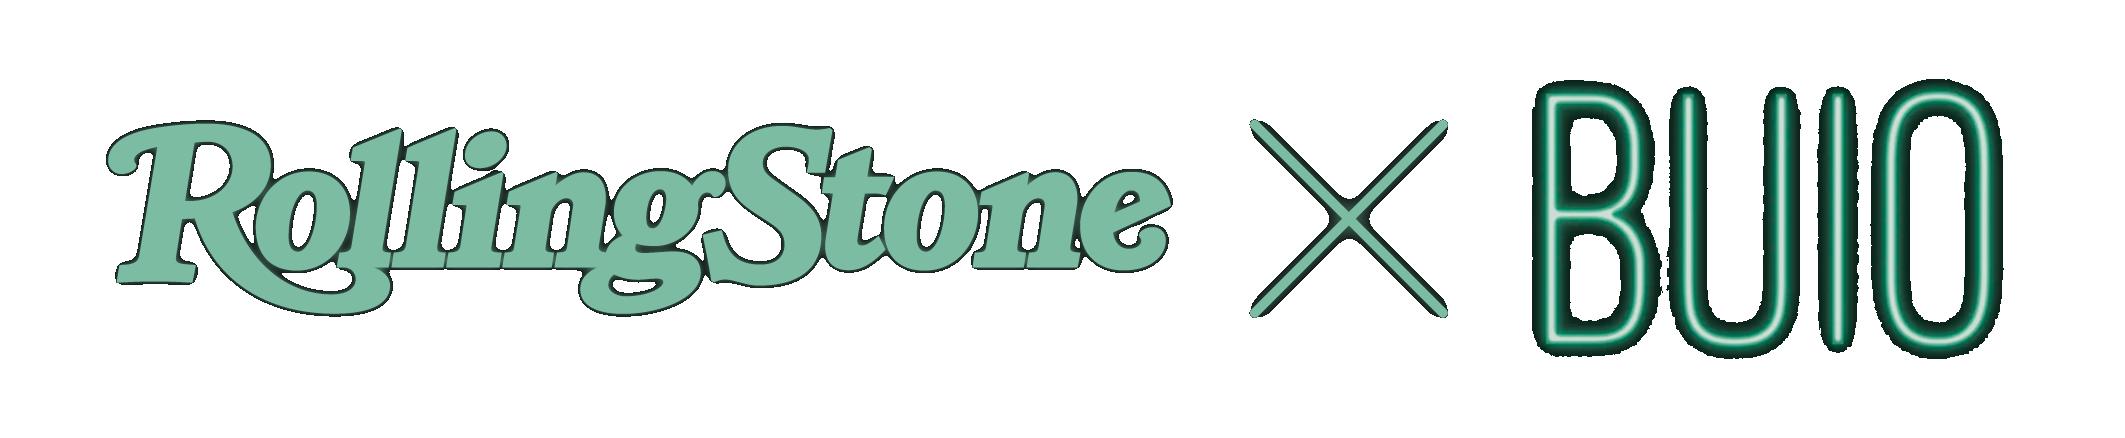 Rolling Stone per BUIO